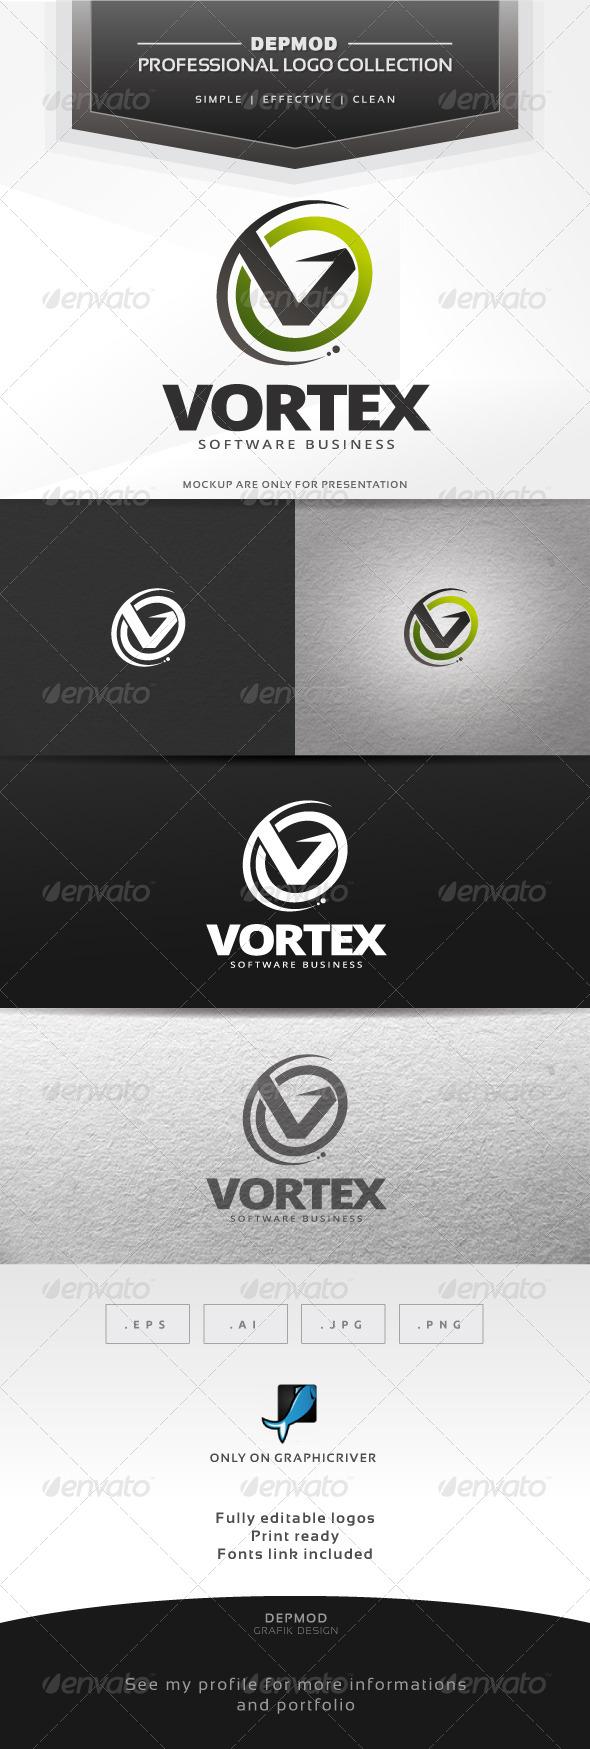 GraphicRiver Vortex Logo 6726808